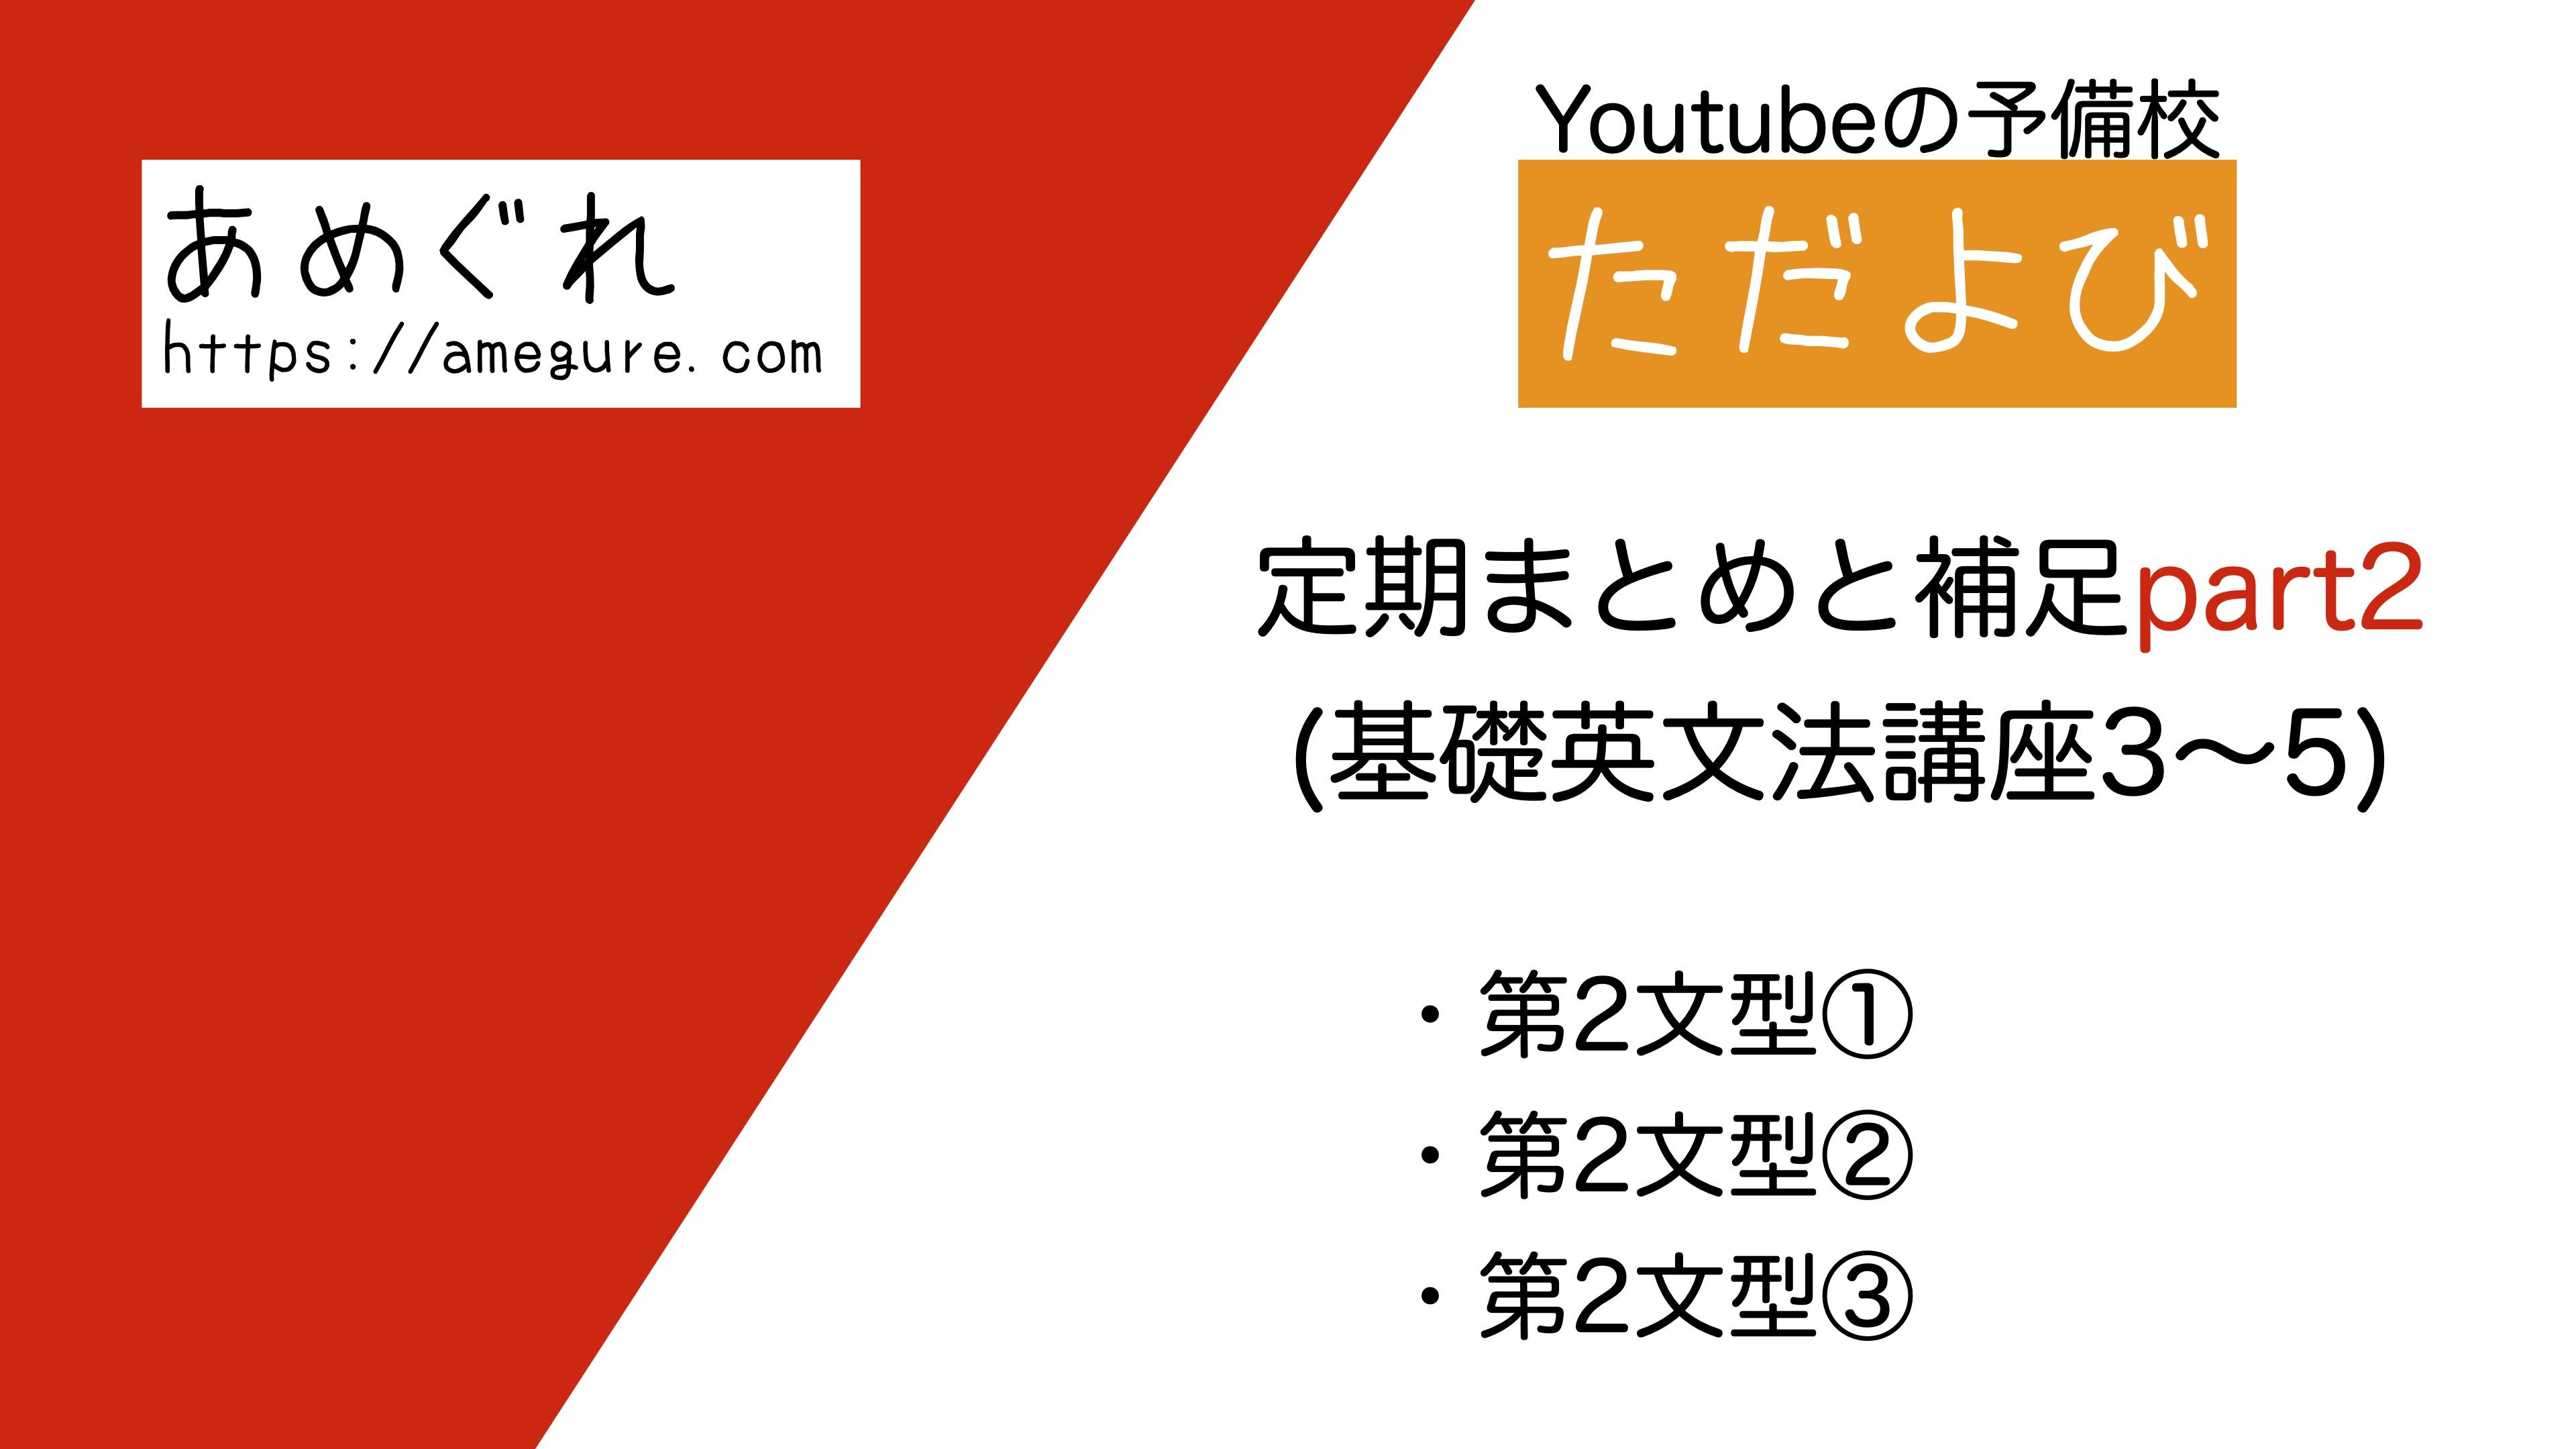 YouTubeの予備校ただよび定期まとめと補足part2